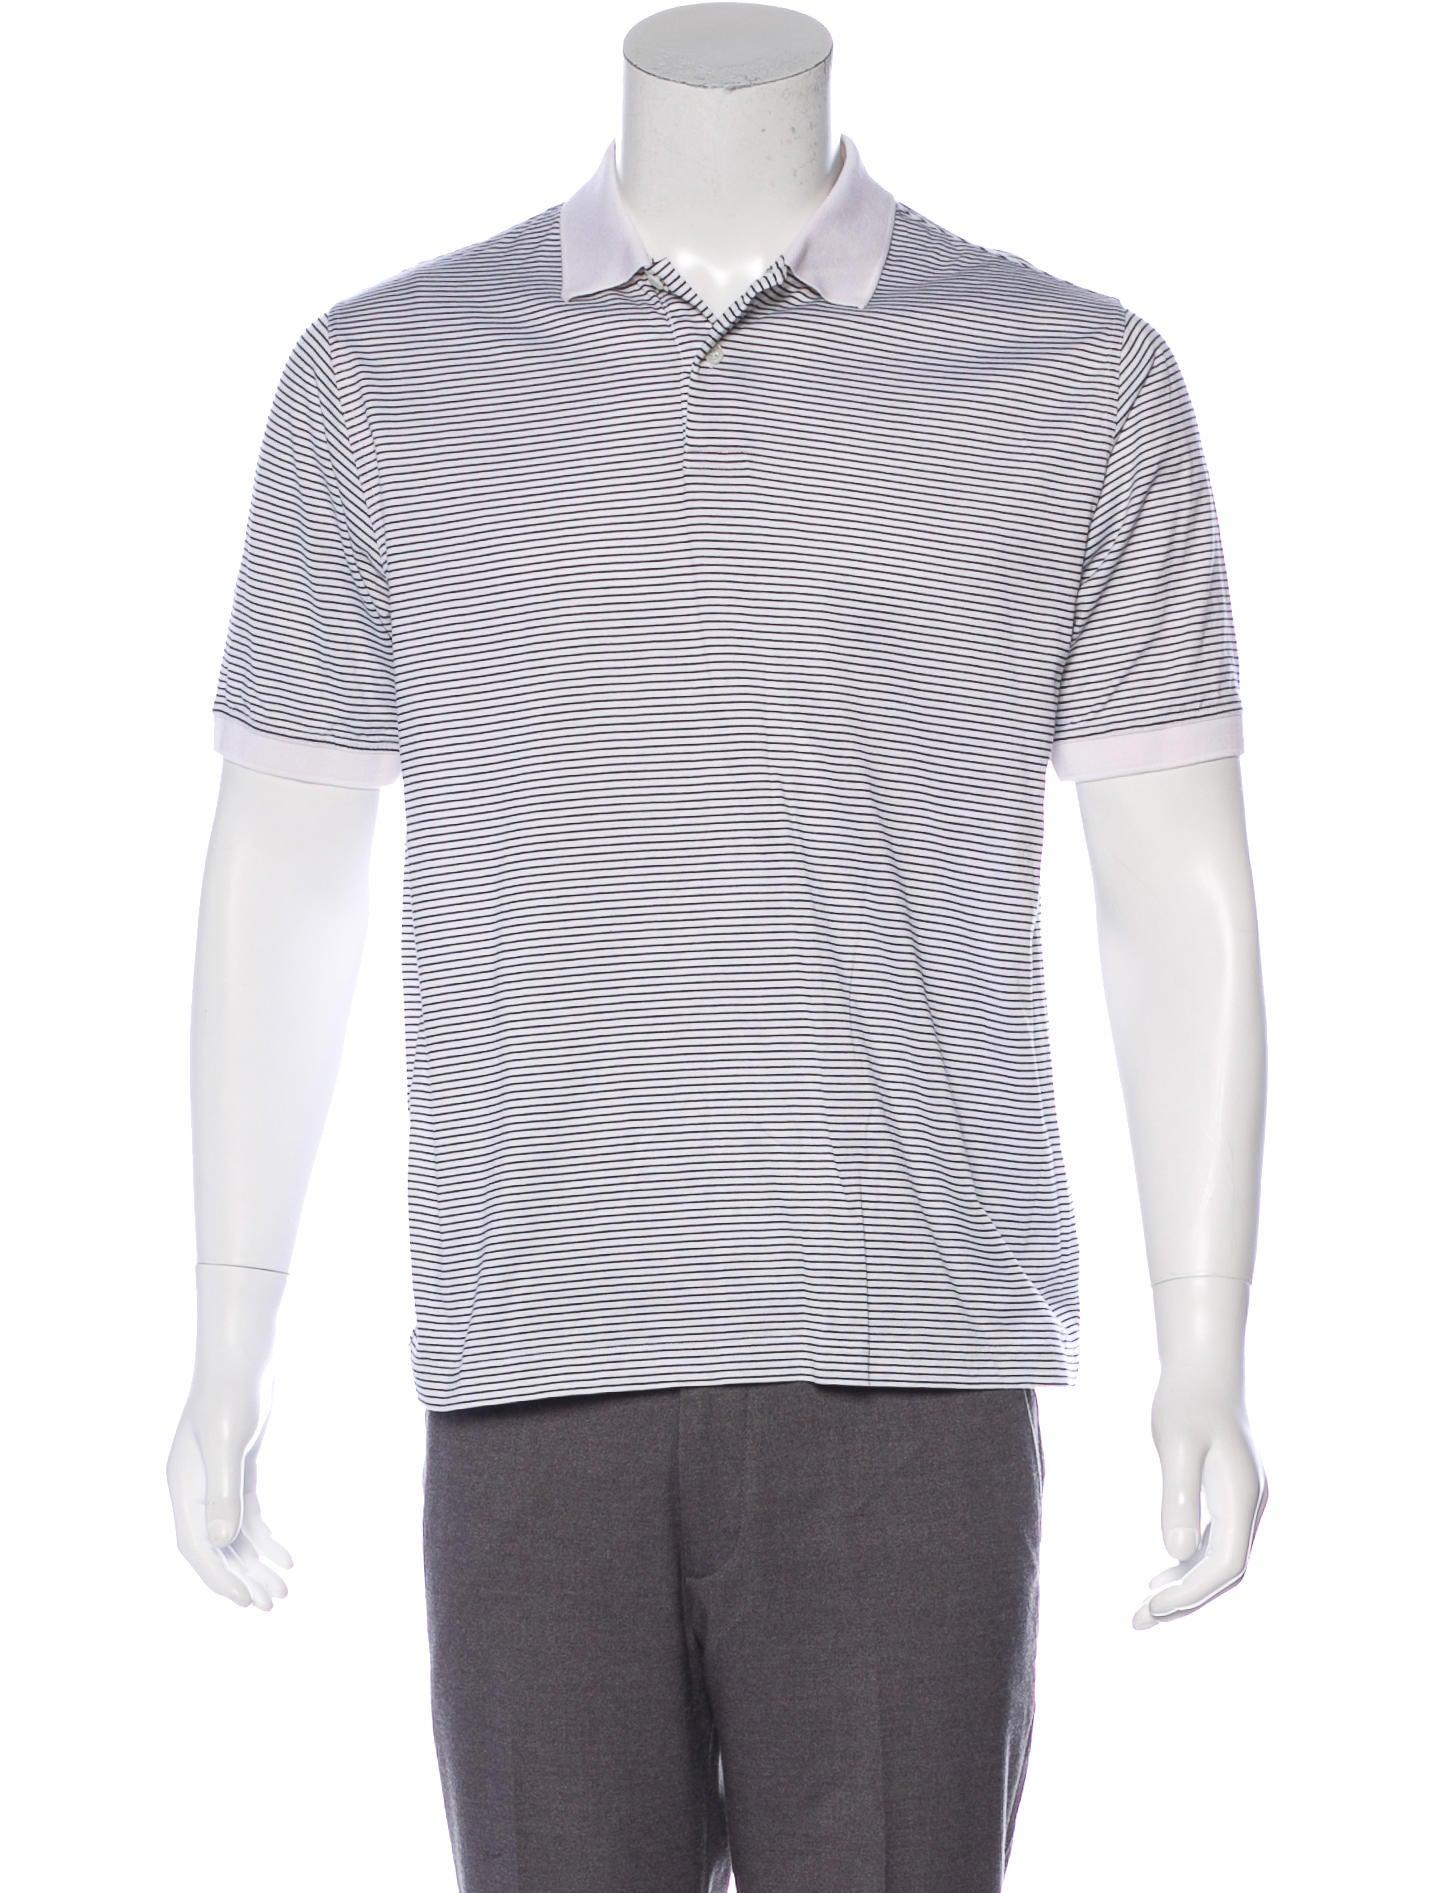 dba3131677e Burberry London Striped Polo Shirt - Clothing - WBURL43041